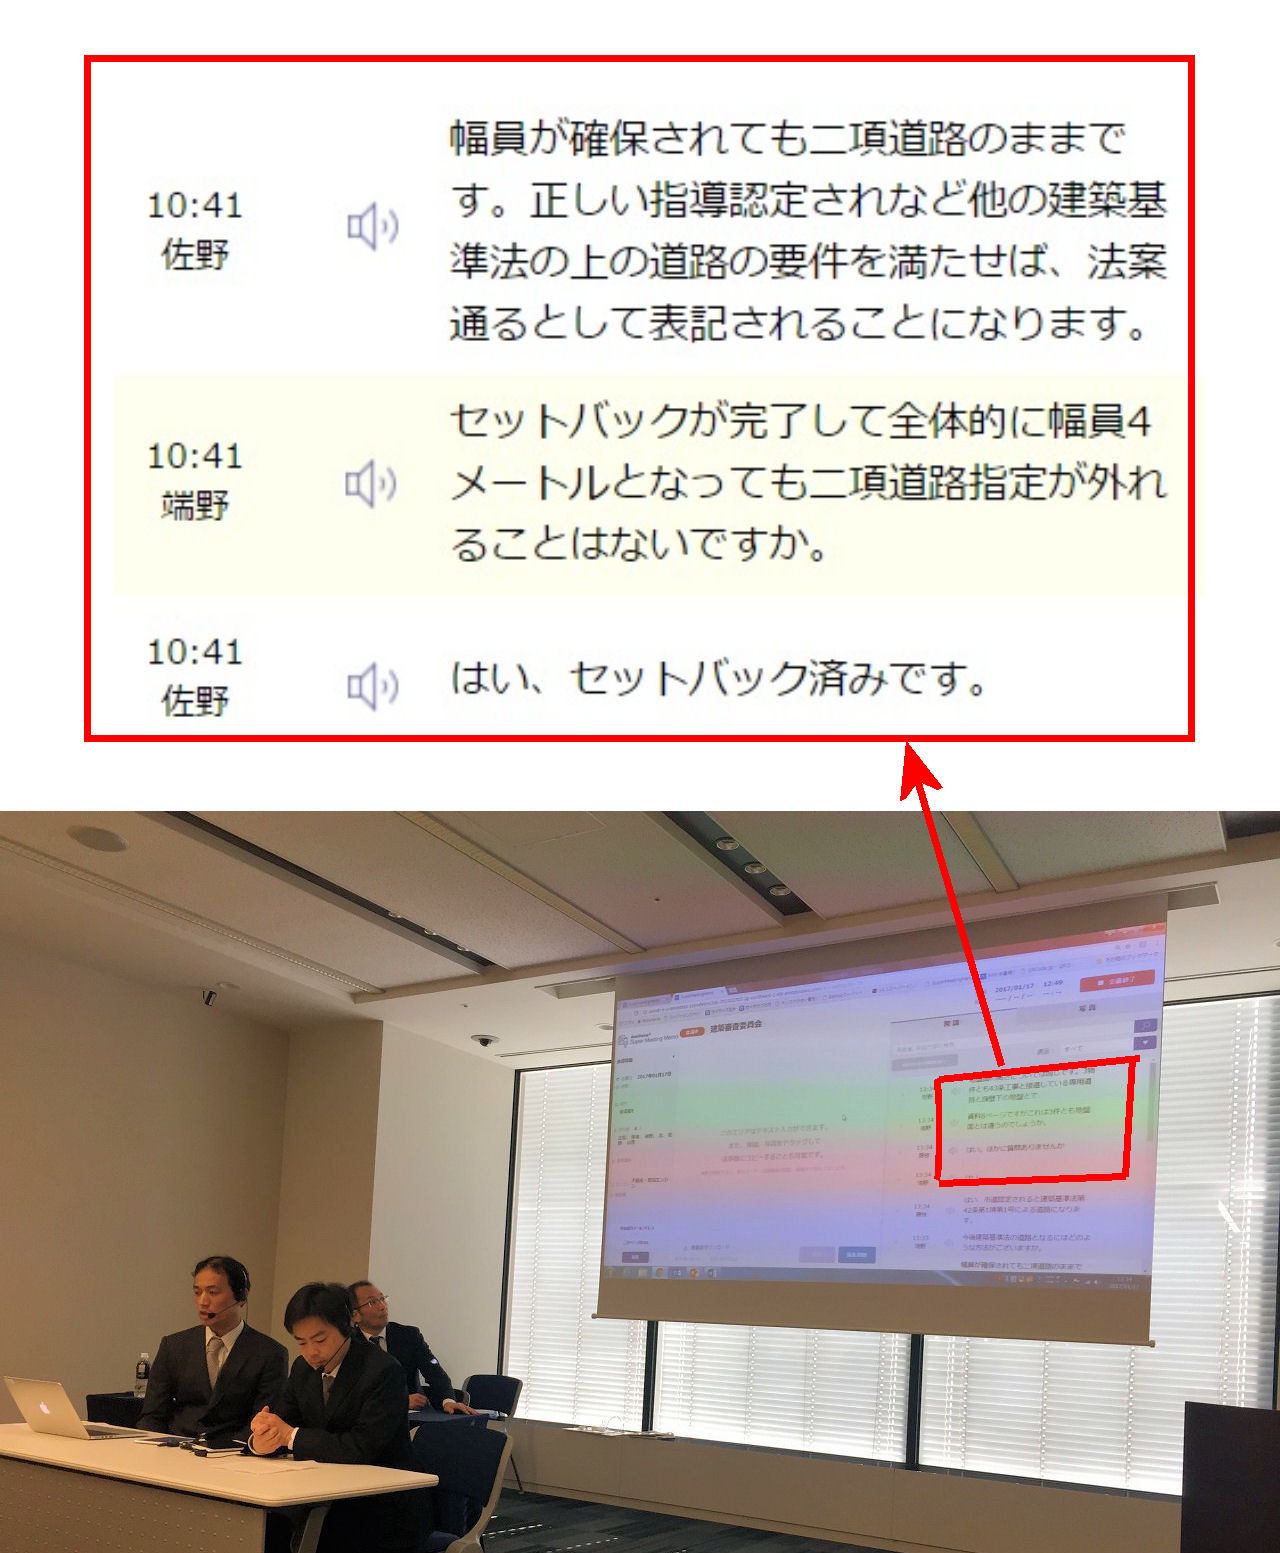 「AmiVoice スーパーミーティングメモ」のデモンストレーション。発言者の名前とともに発言内容が即座にテキスト化される(写真:特記以外は家入龍太)